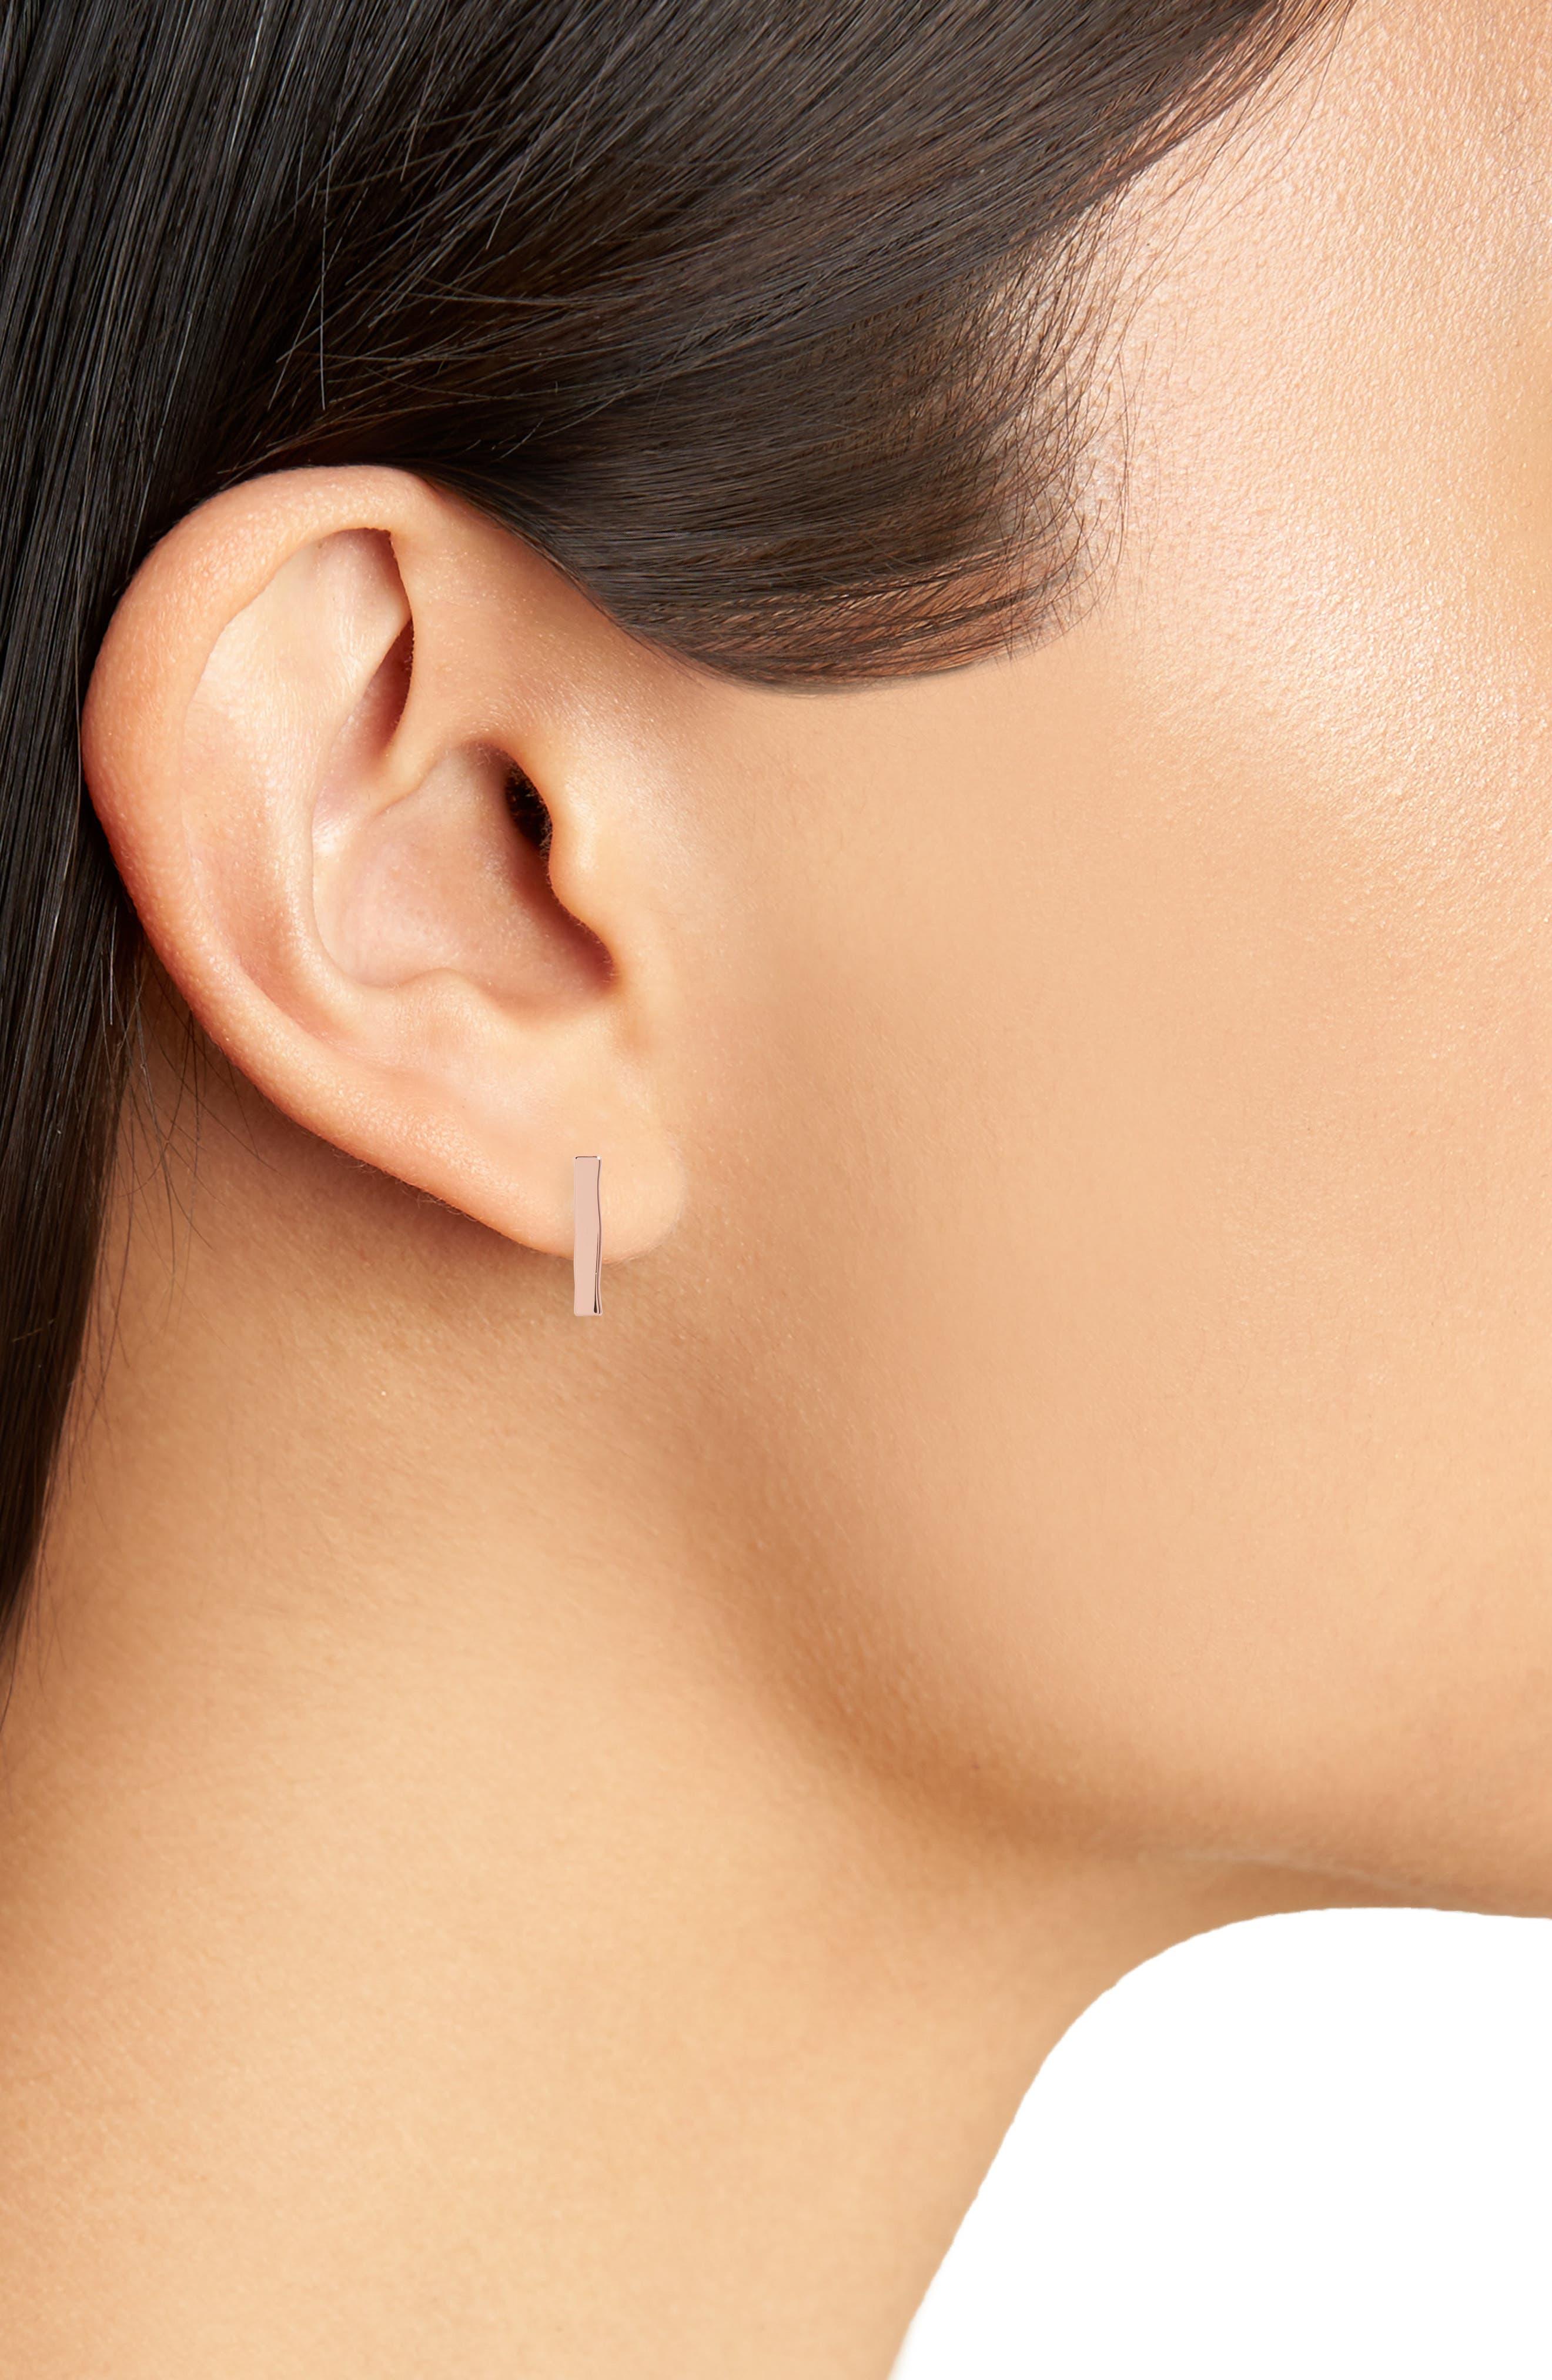 Taner Mini Stud Earrings,                             Alternate thumbnail 3, color,                             ROSE GOLD